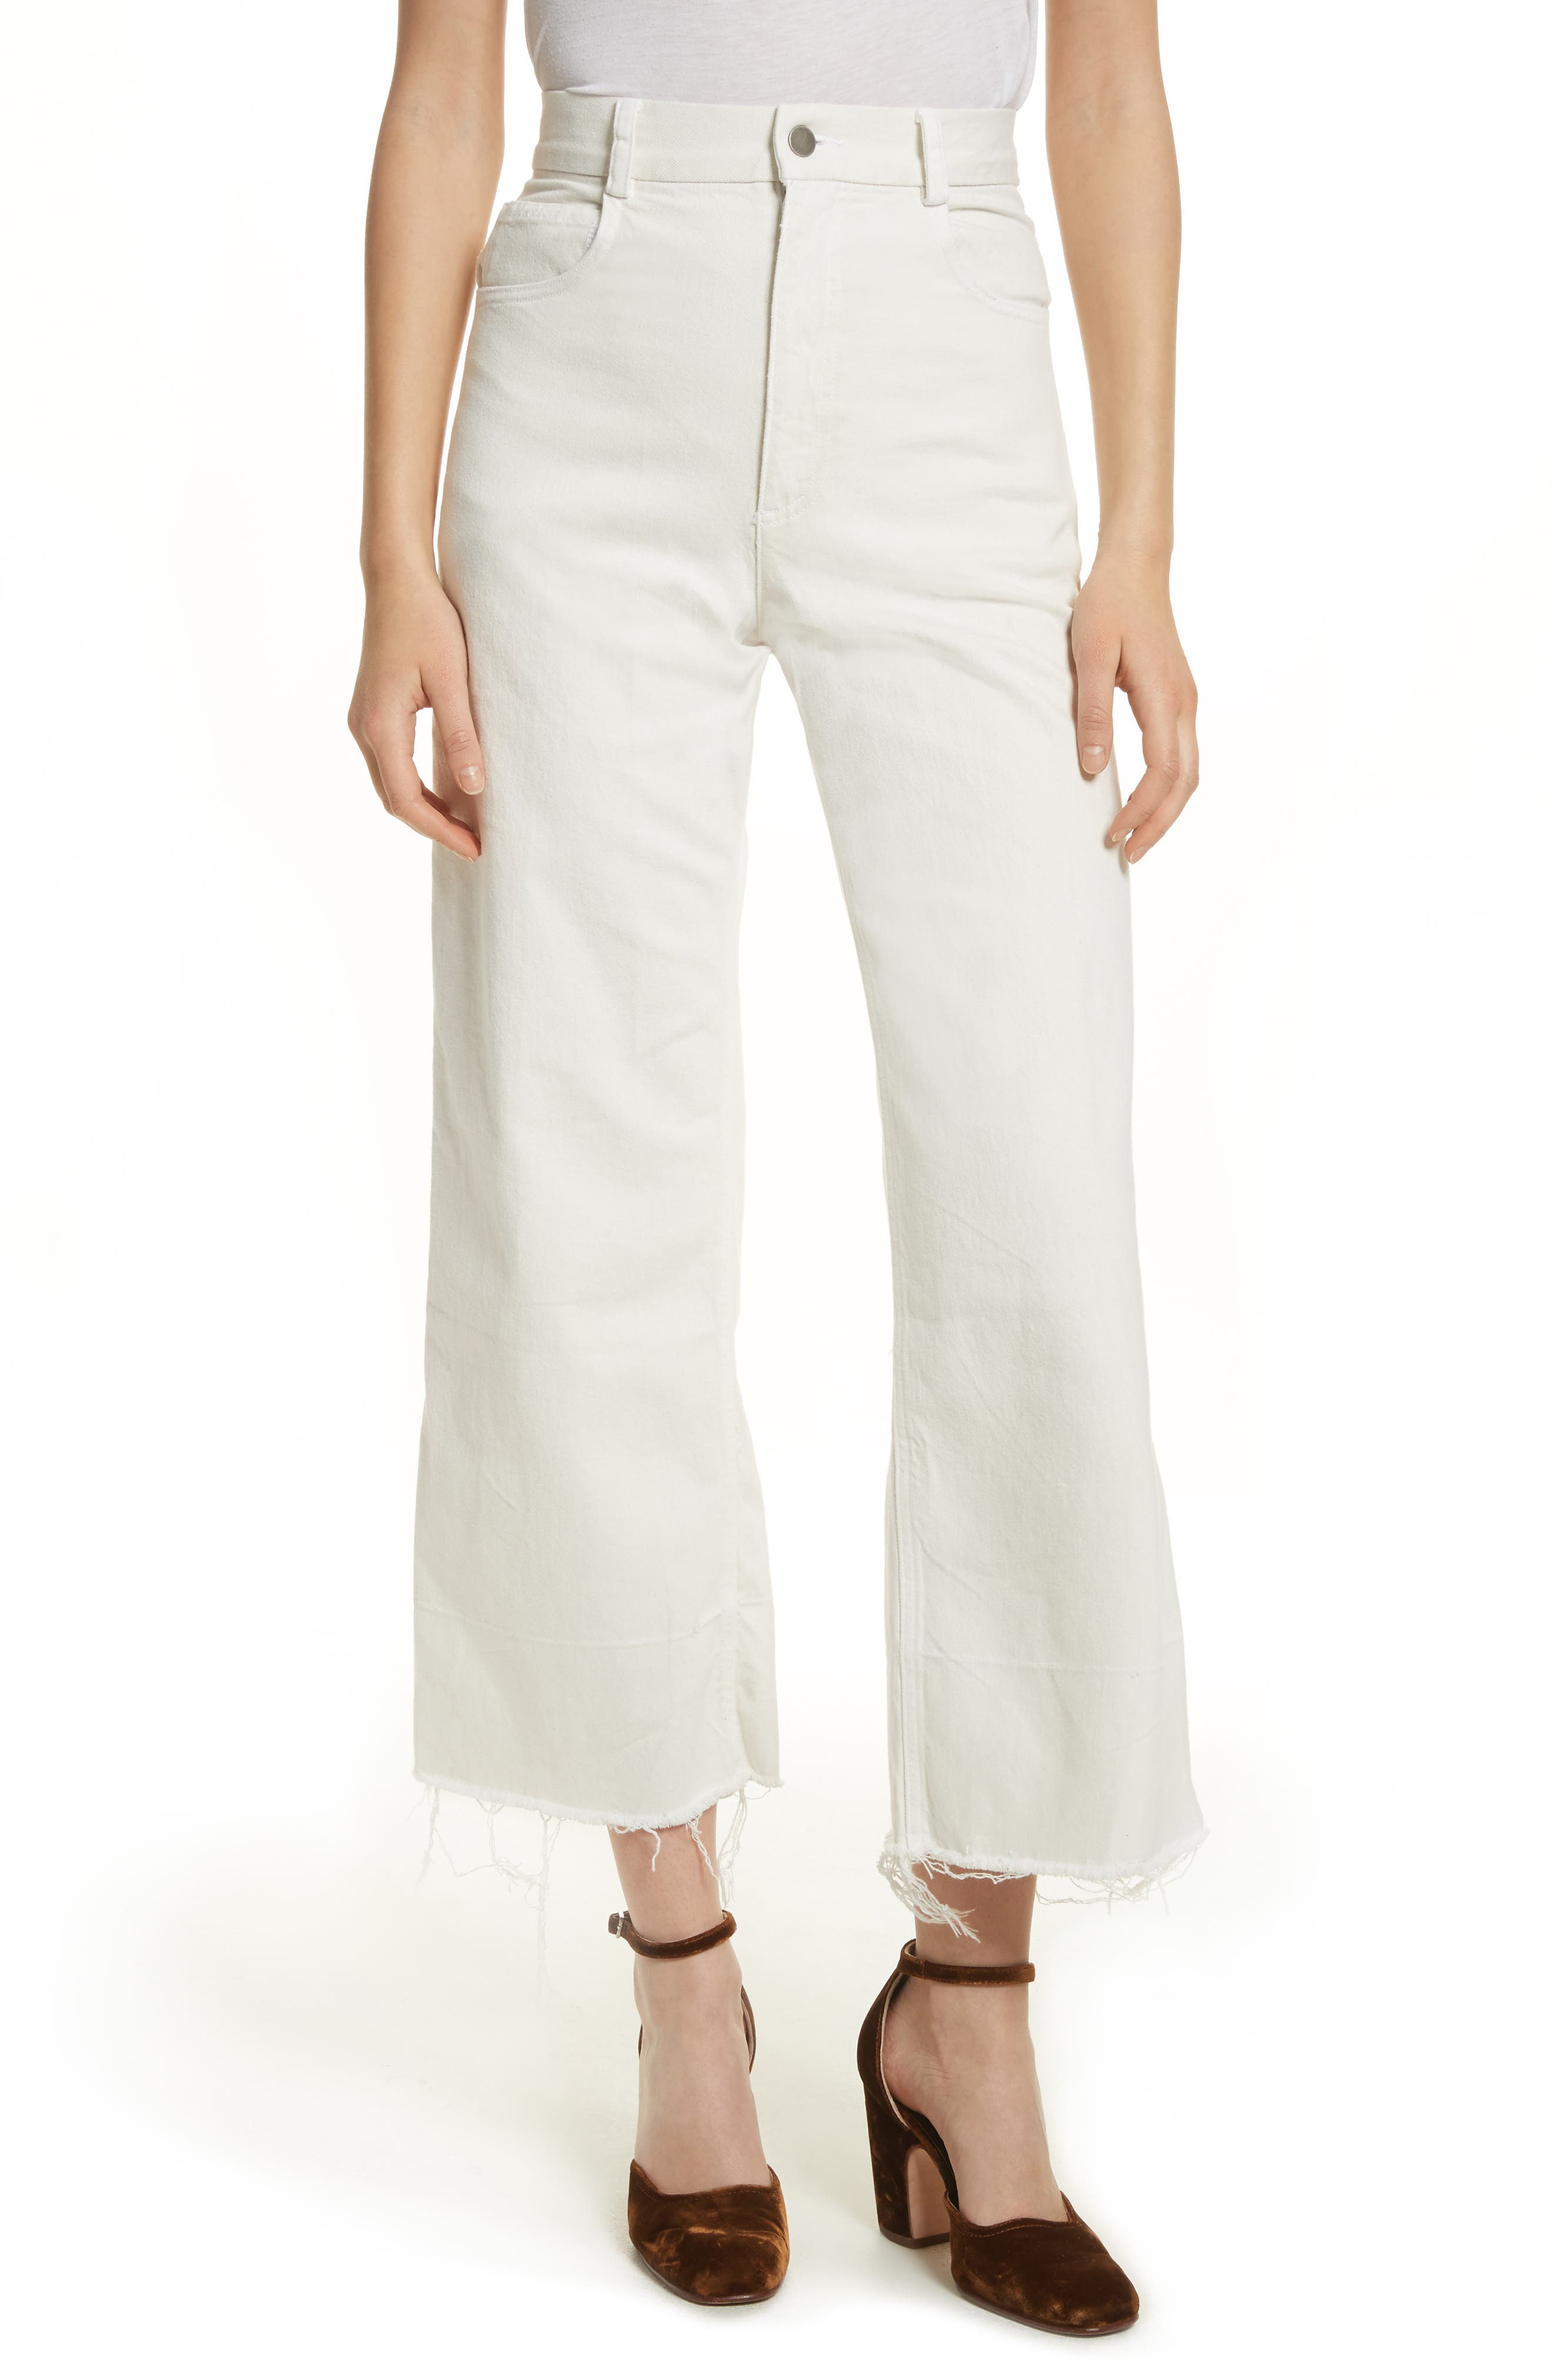 Rachey Comey Legion Crop Wide Leg Pants,                         Main,                         color, Dirty White